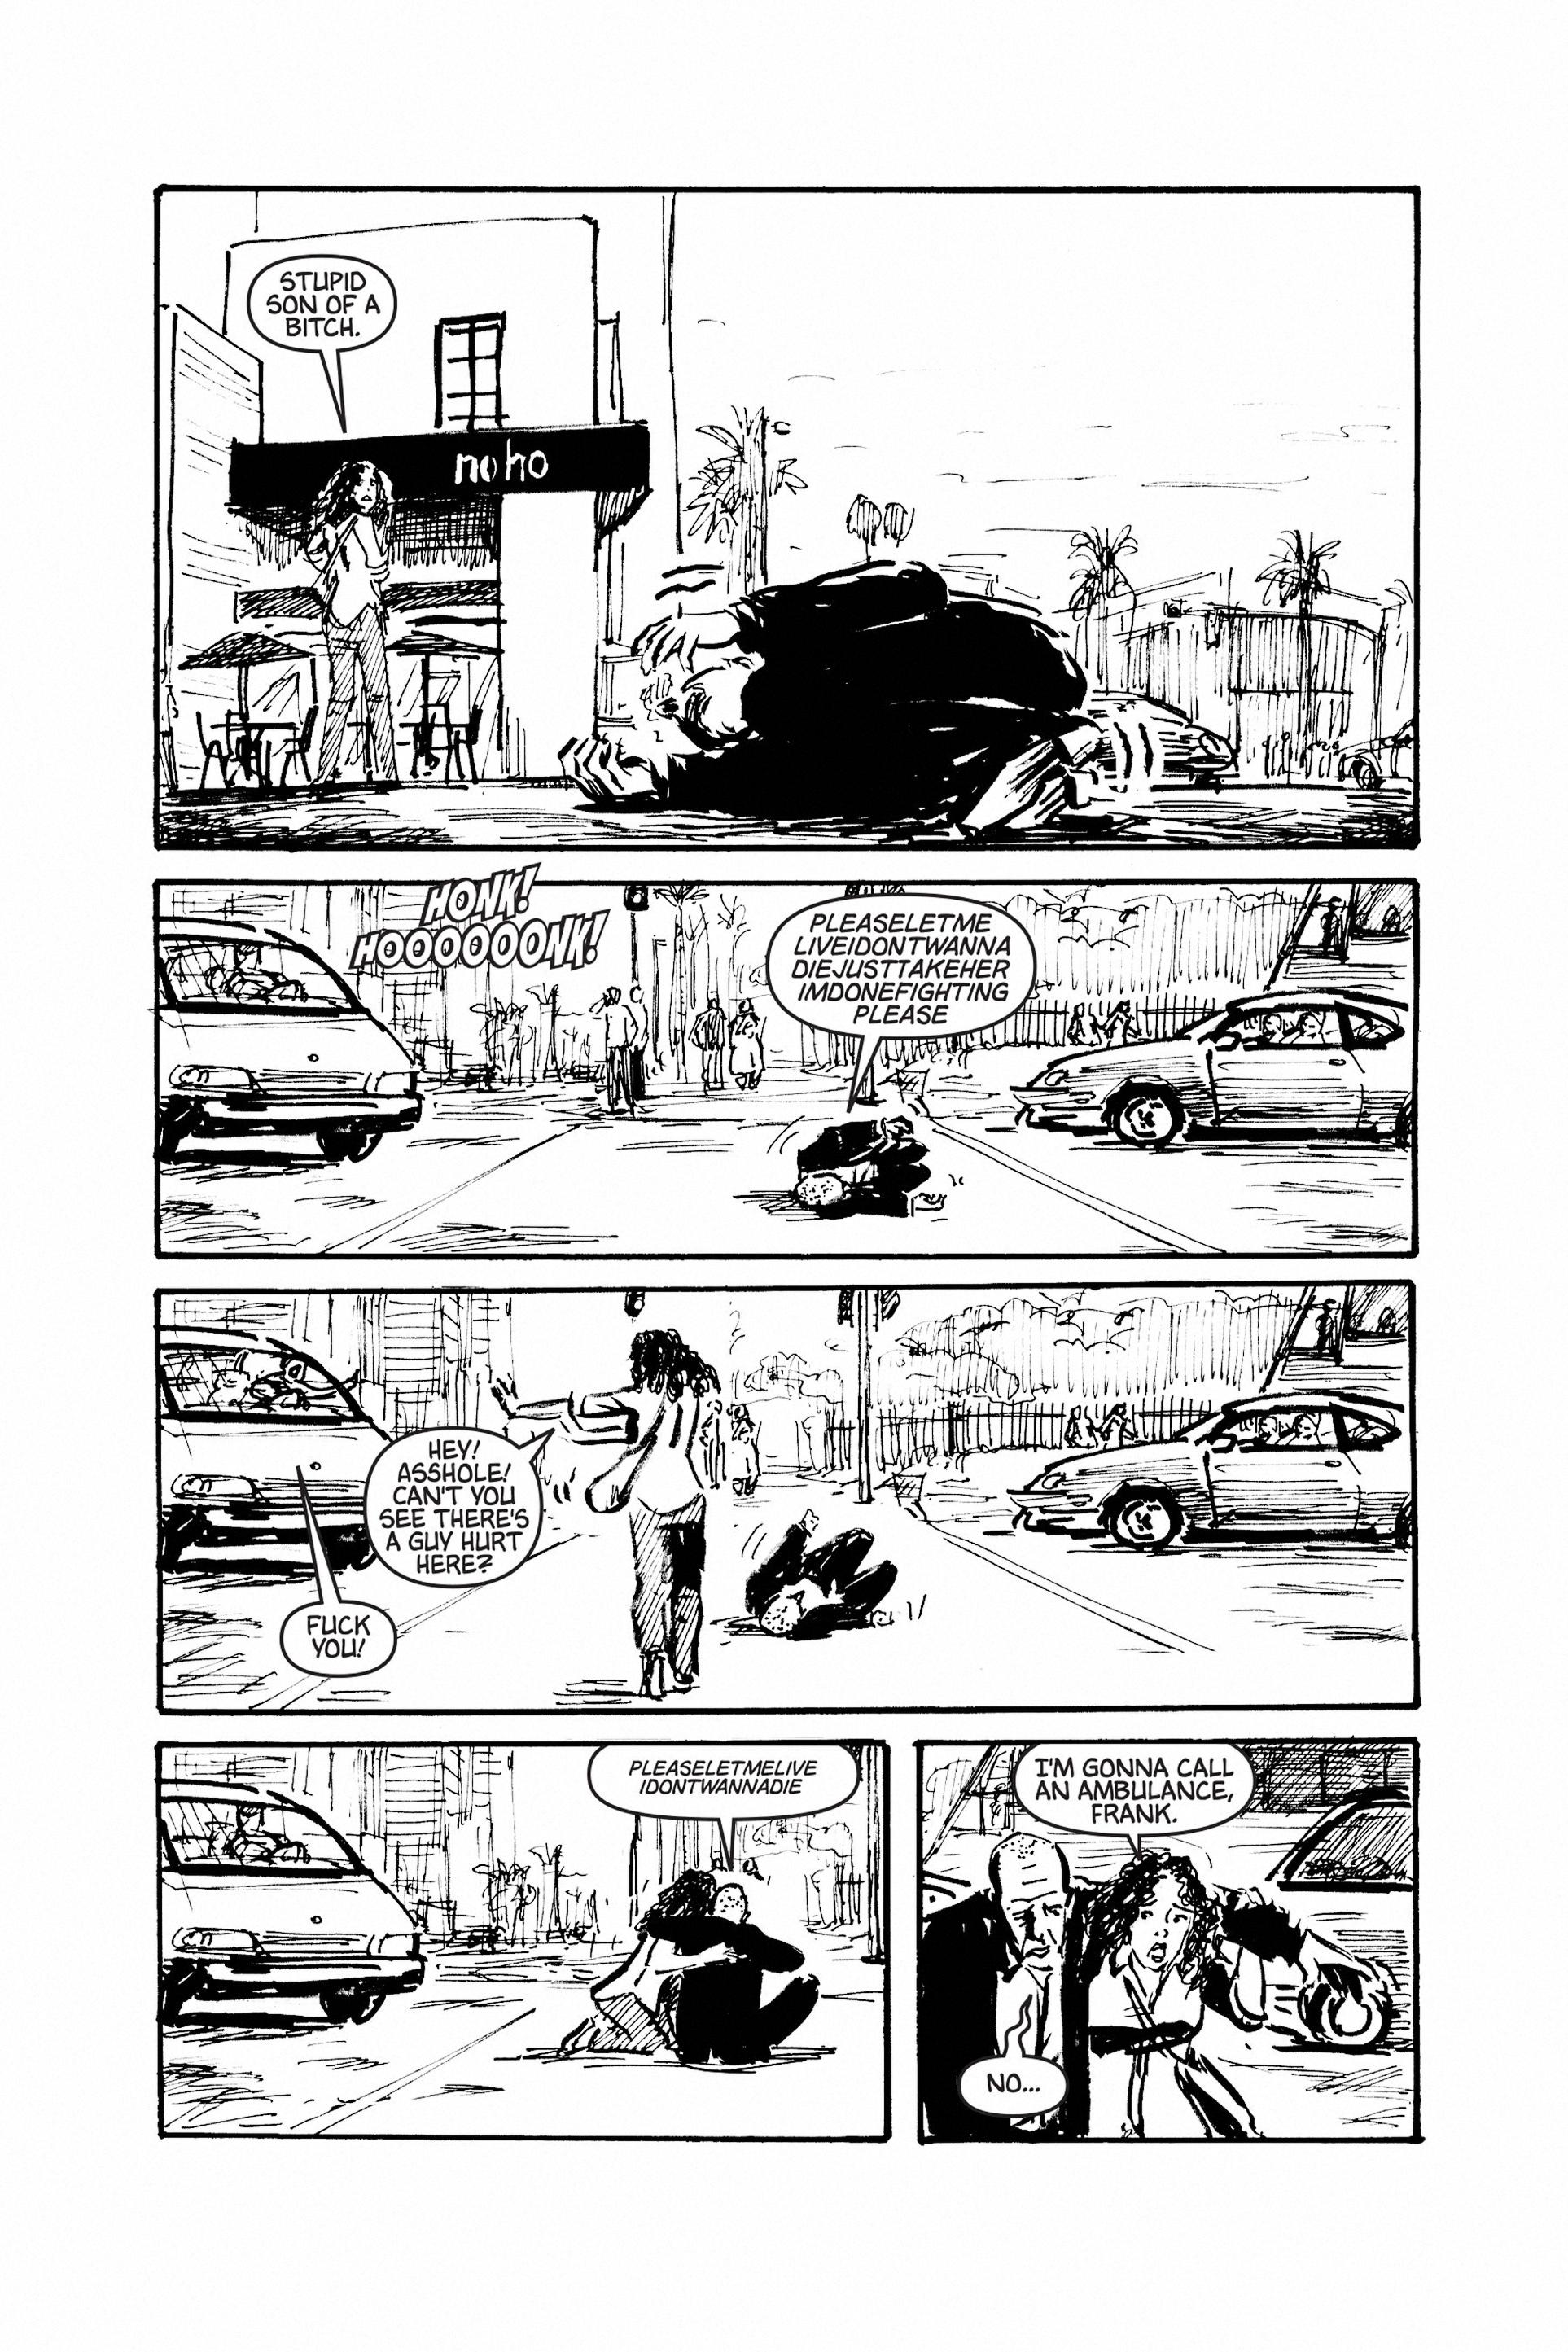 Read online Tumor comic -  Issue # TPB - 151